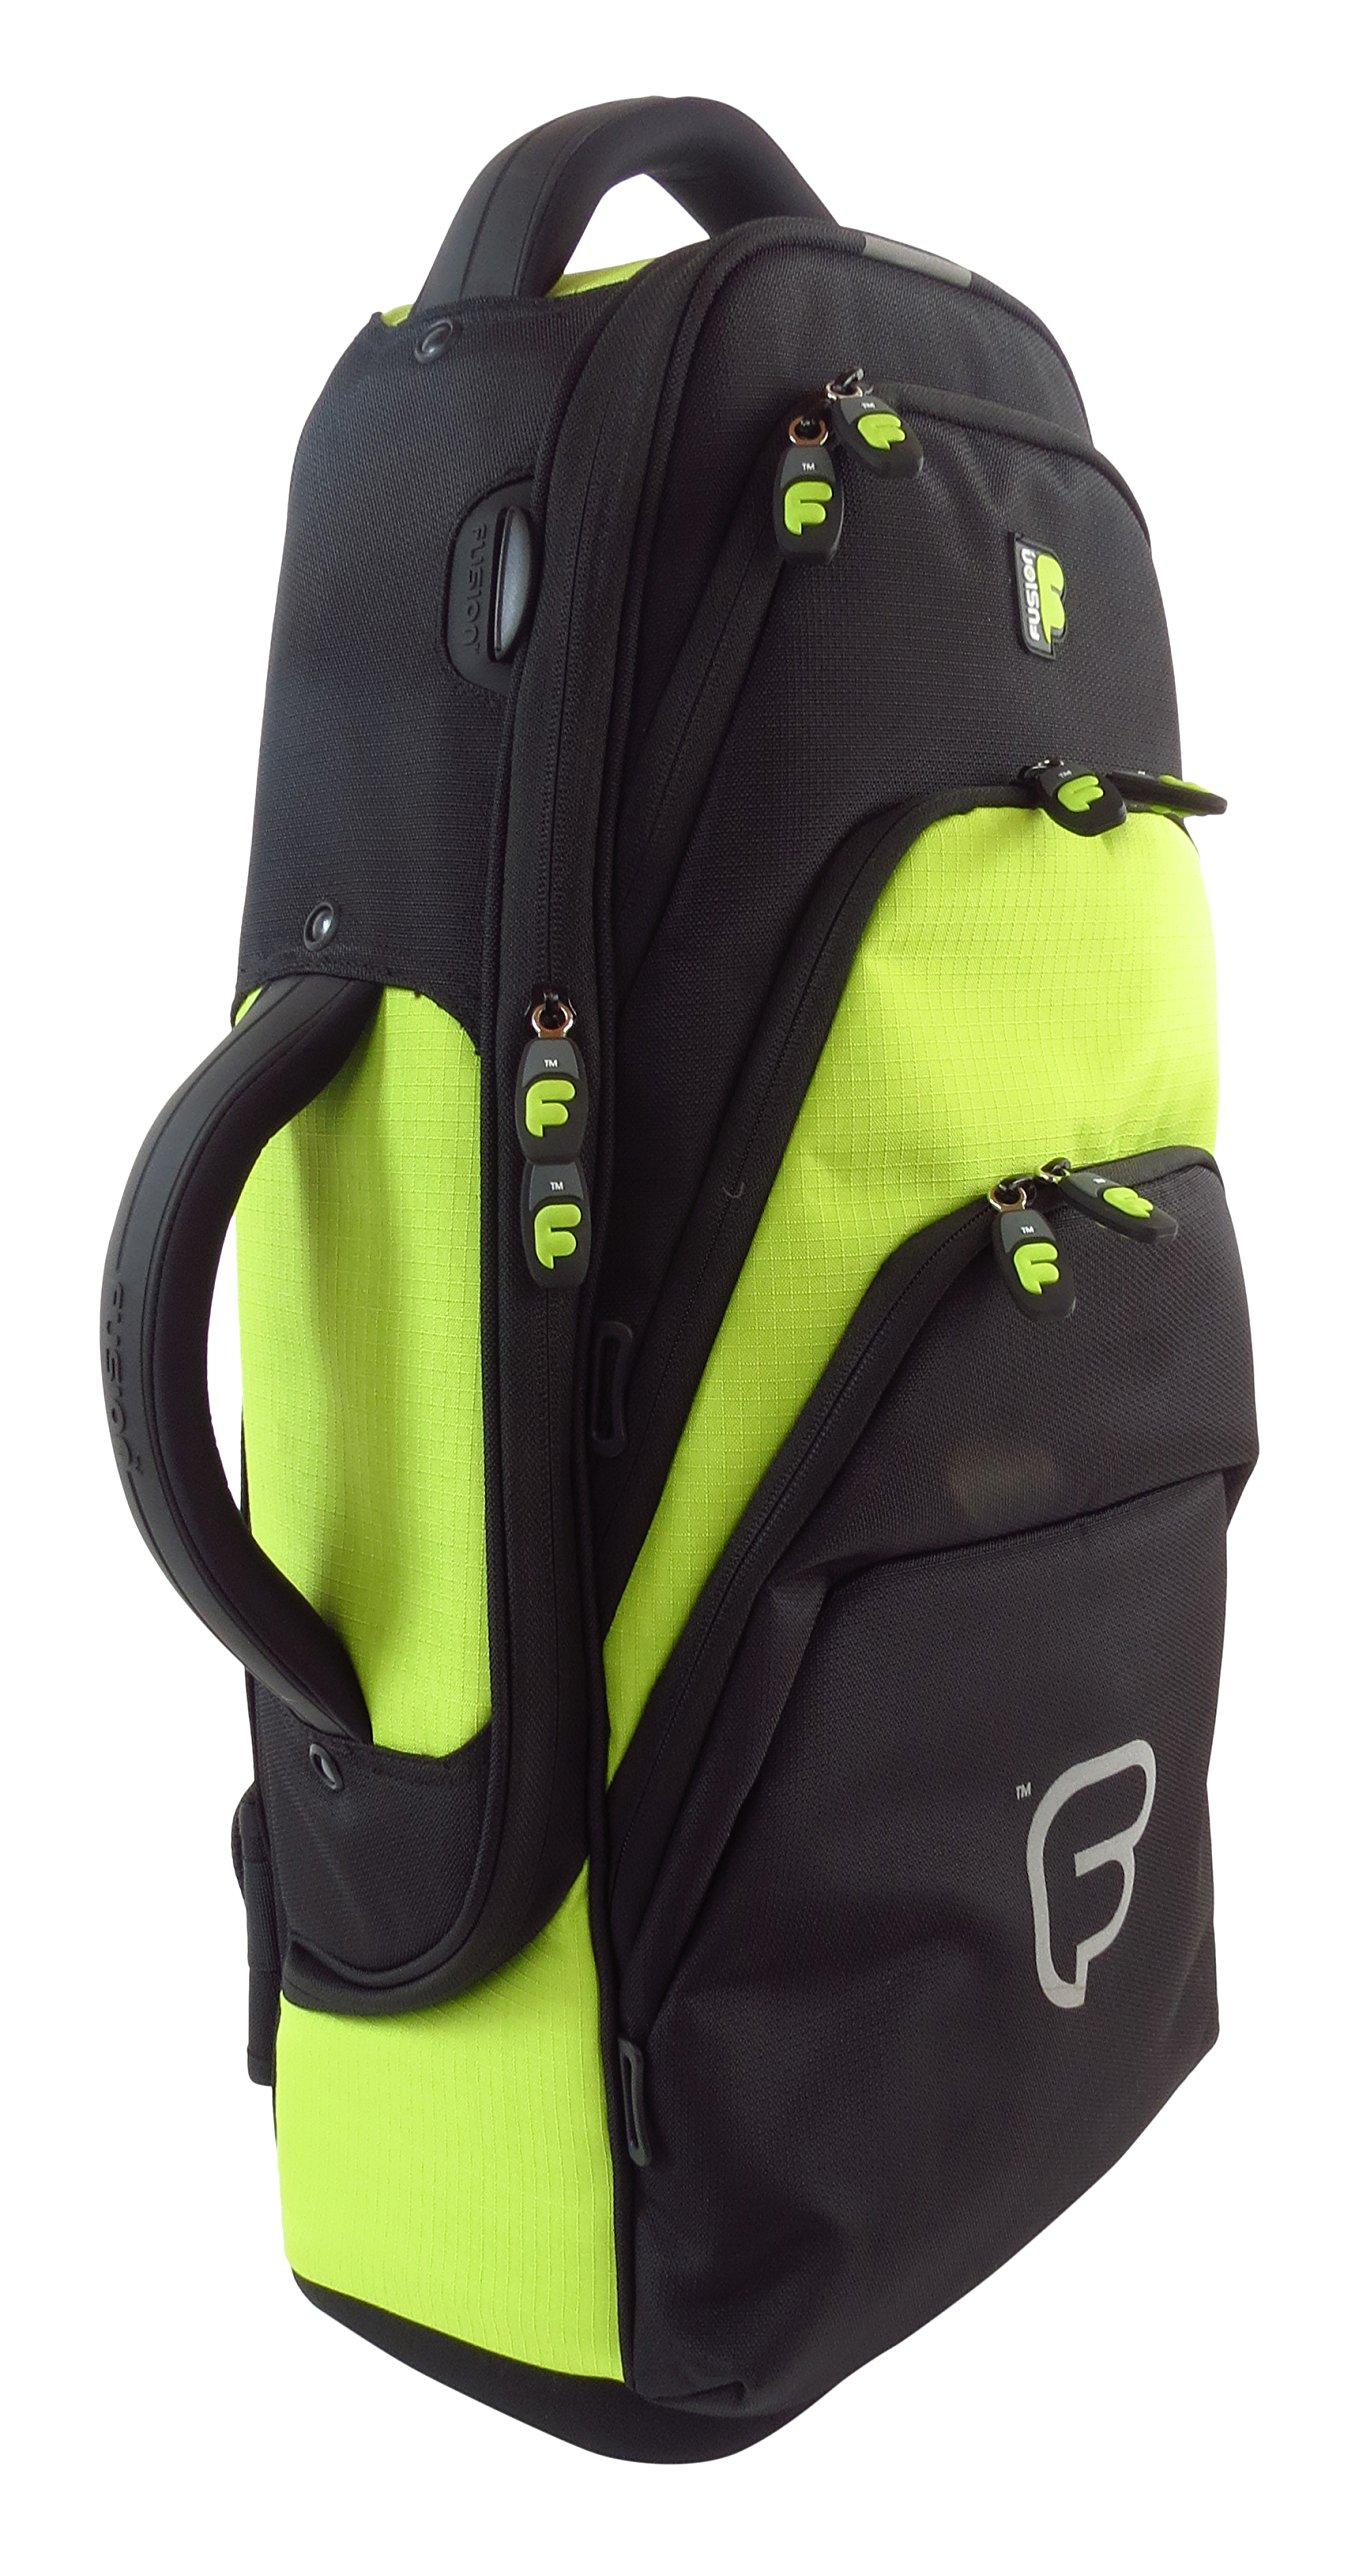 Fusion Premium Series (FB-PW-01-L) - Alto Saxophone Gig Bag, Black/Lime